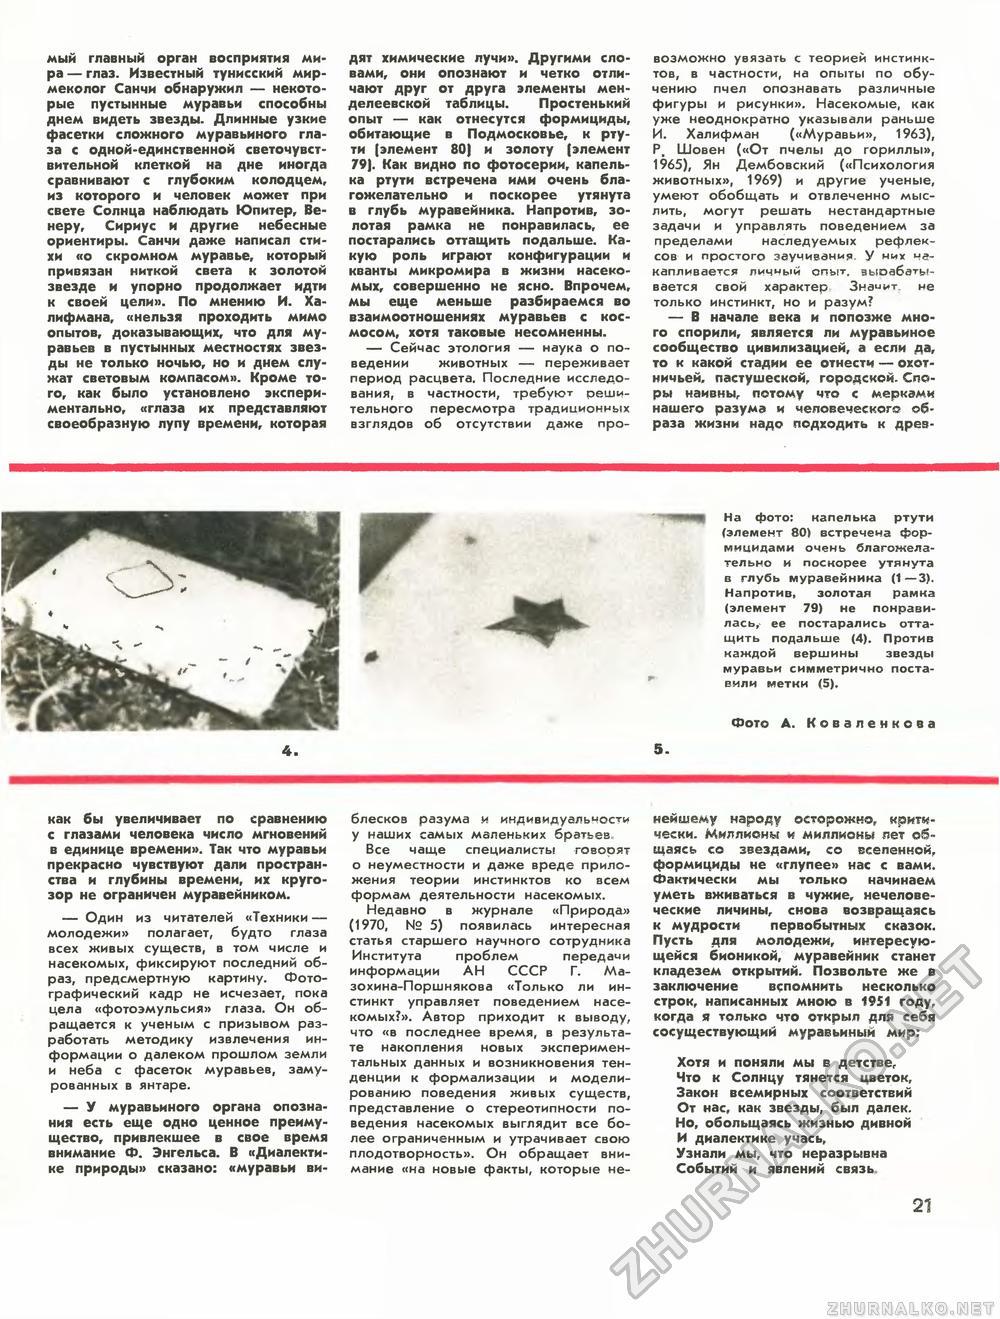 http://zhurnalko.net/images/5/0/50644b2650d360374982/page0023.jpg